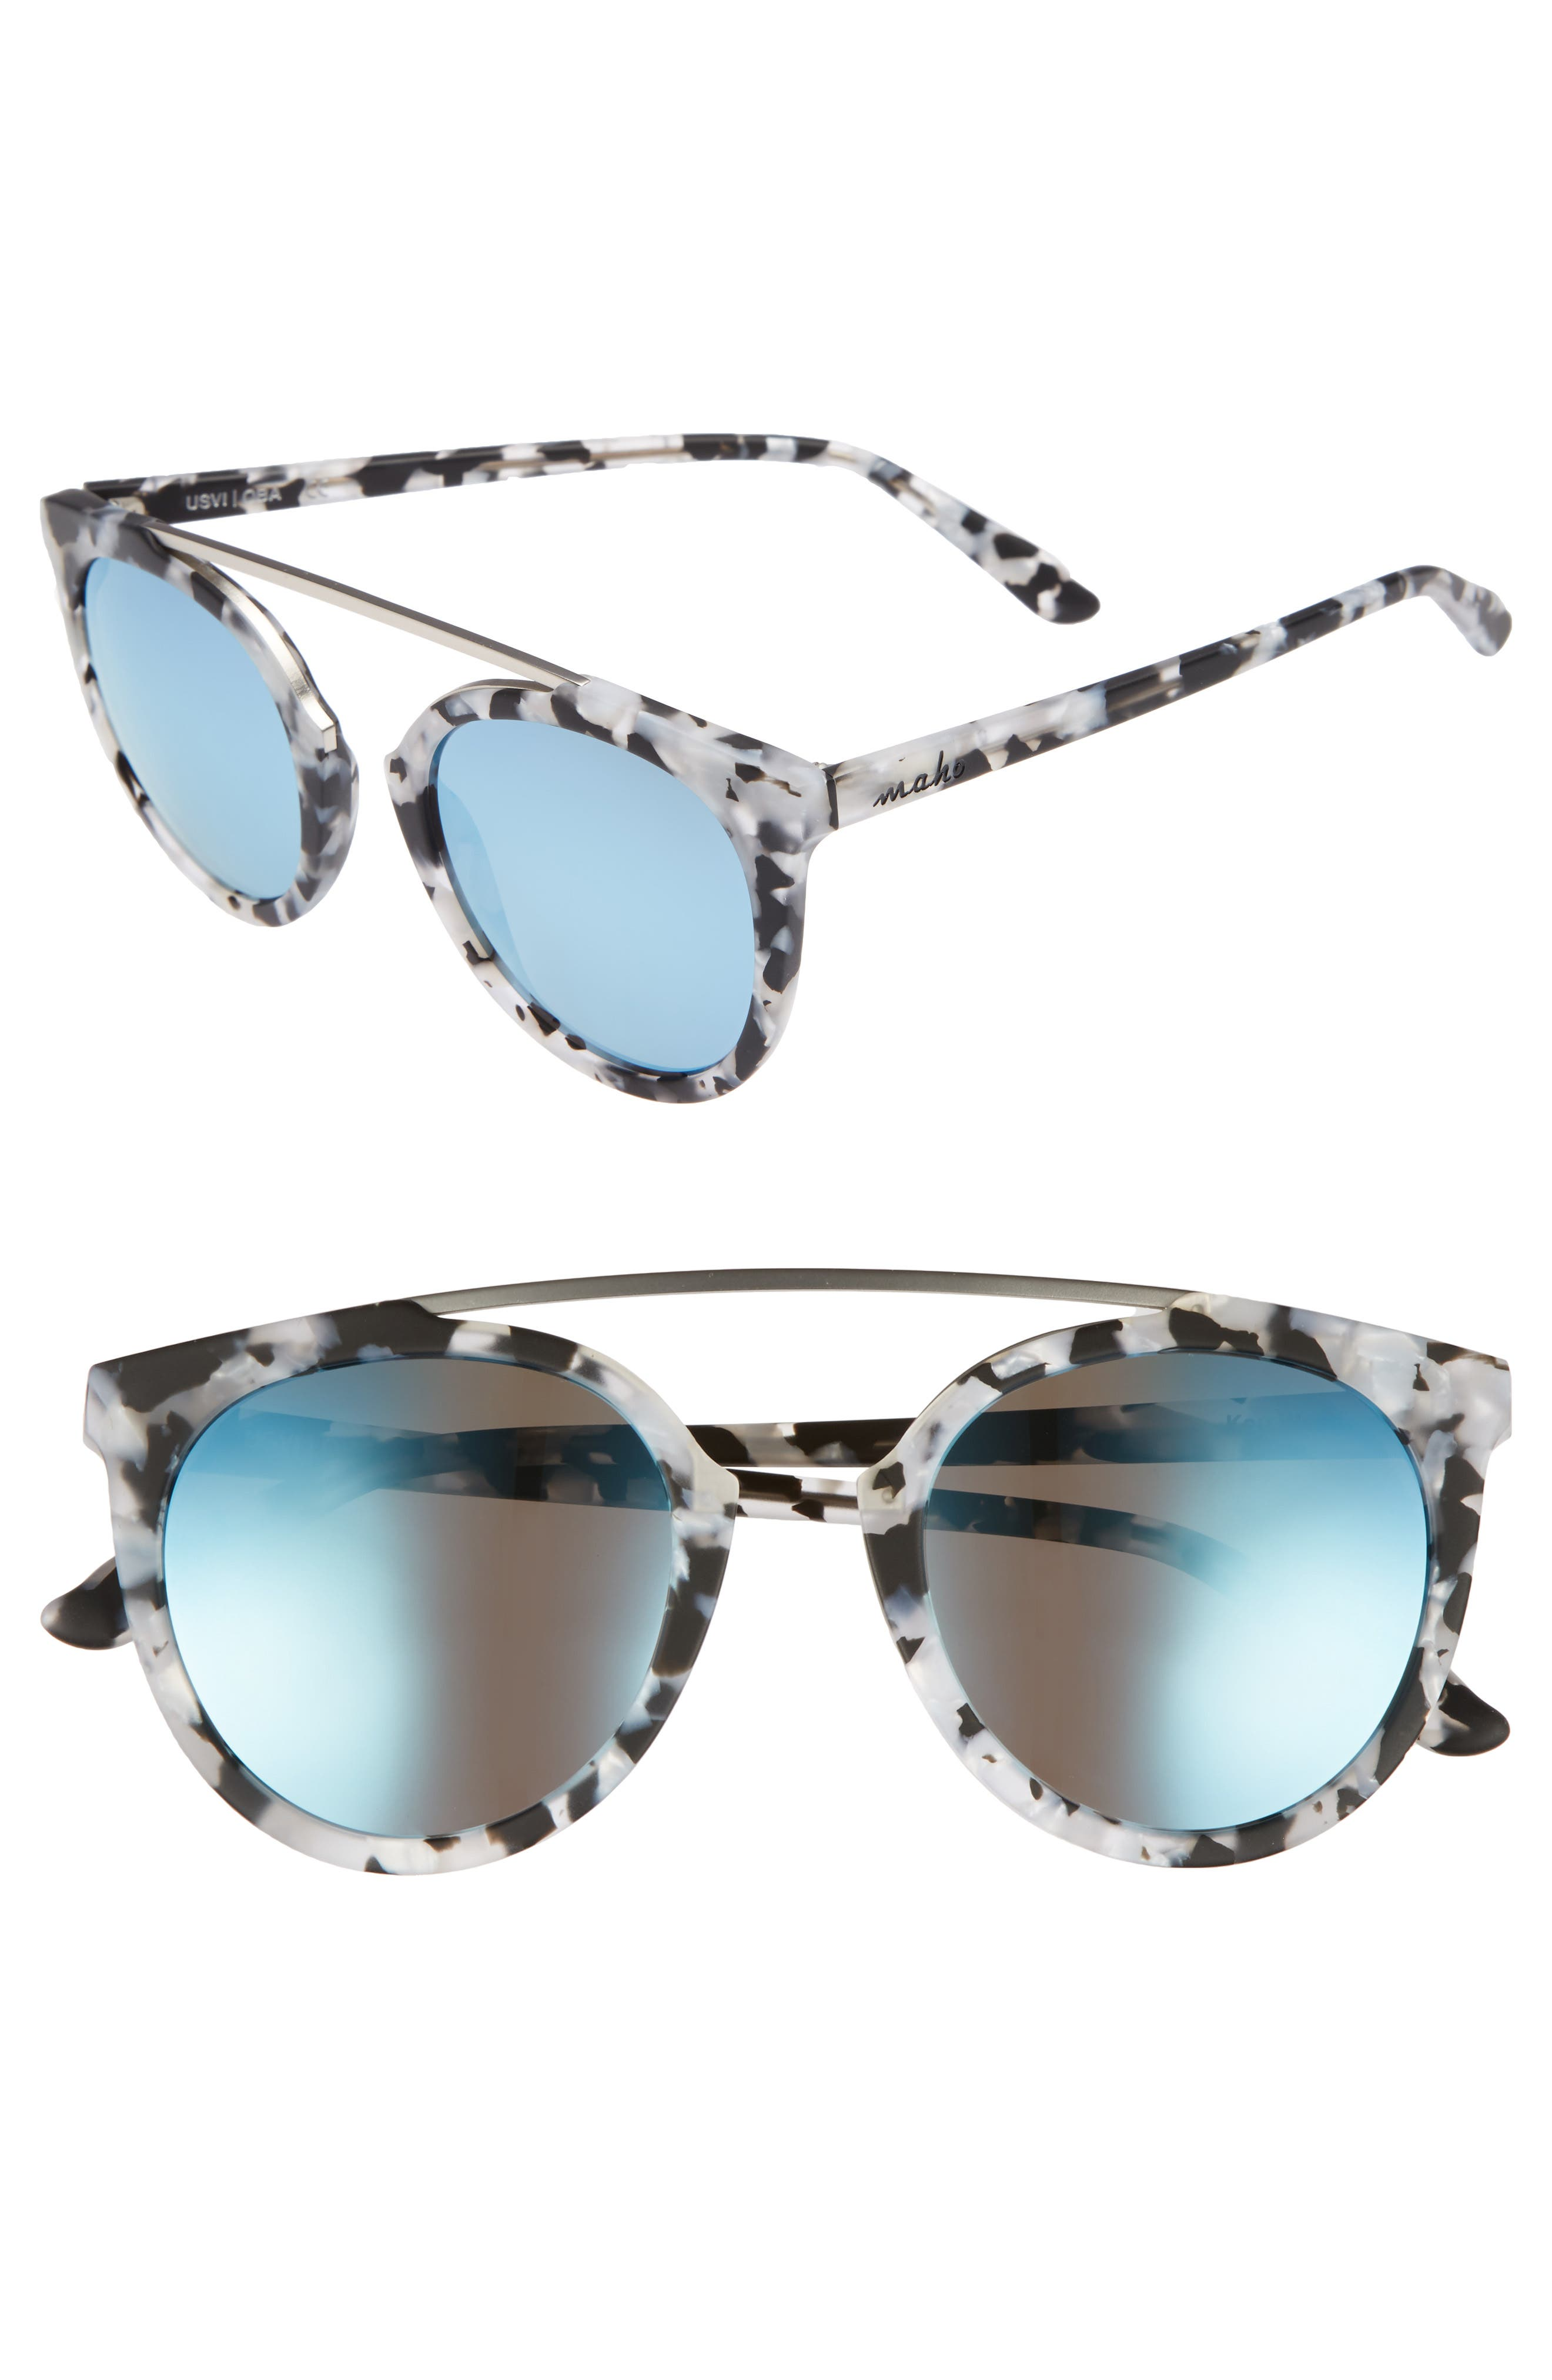 Key West 50mm Polarized Aviator Sunglasses,                         Main,                         color, Marble